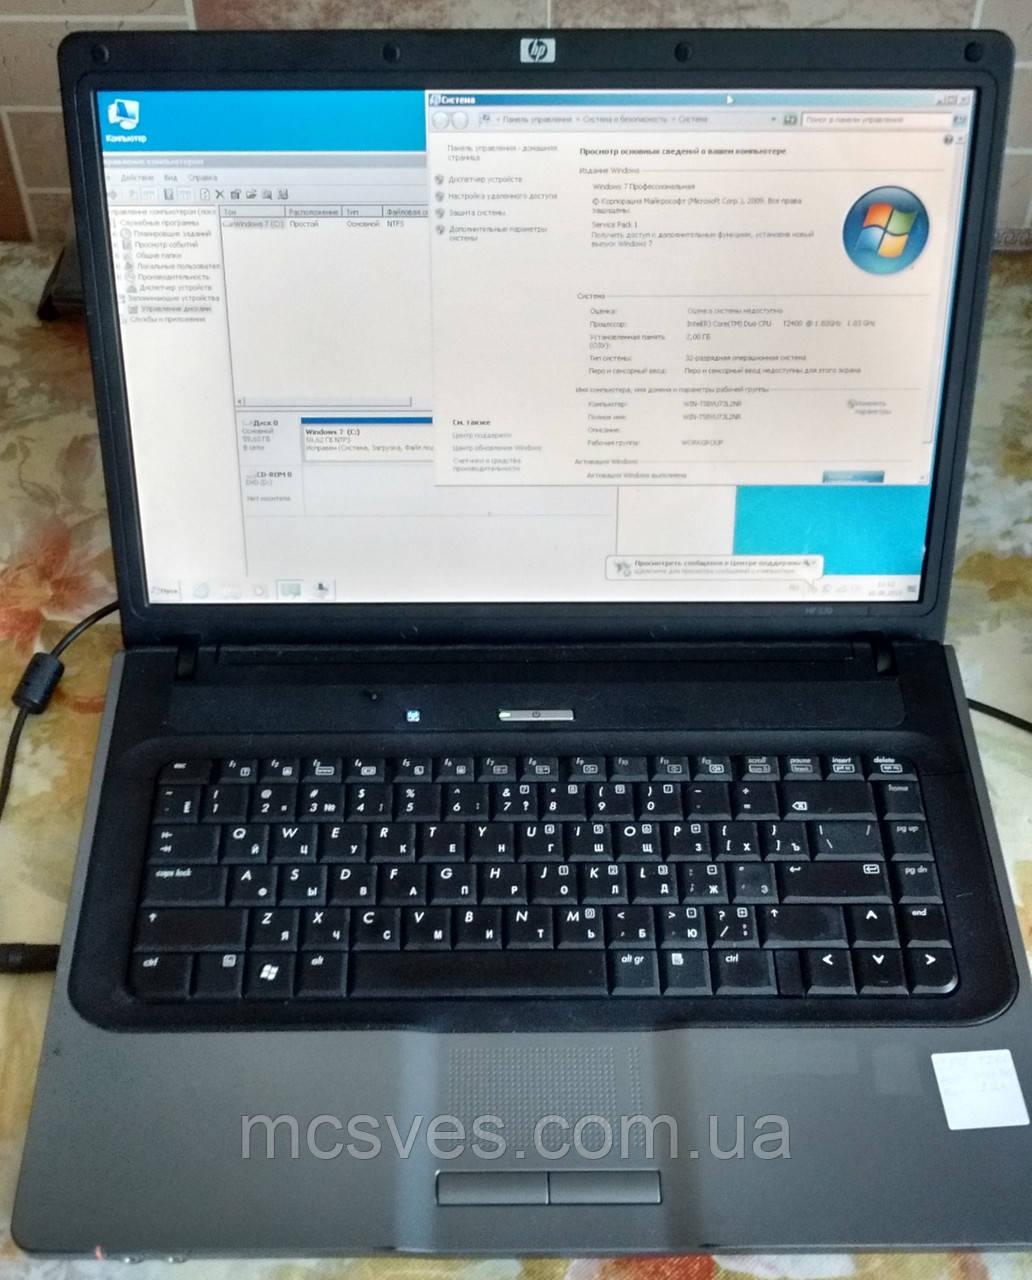 Ноутбук HP Compaq 530 Core2 Duo T2400 / 2 GB / SSD 64 Gb / DVD-RW